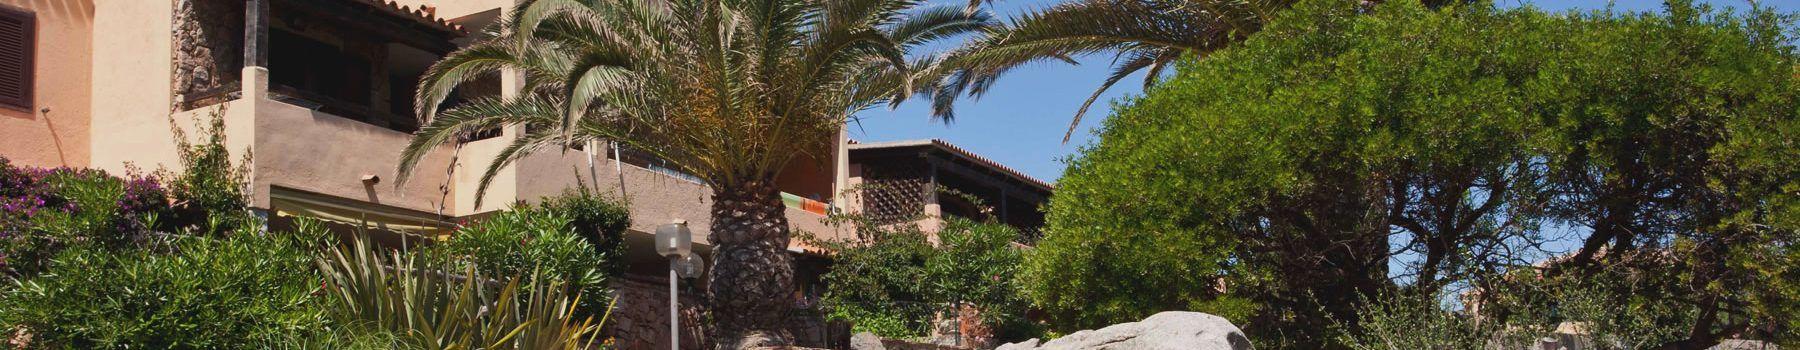 residence-baia-de-bahas-ingresso-del-residence-1